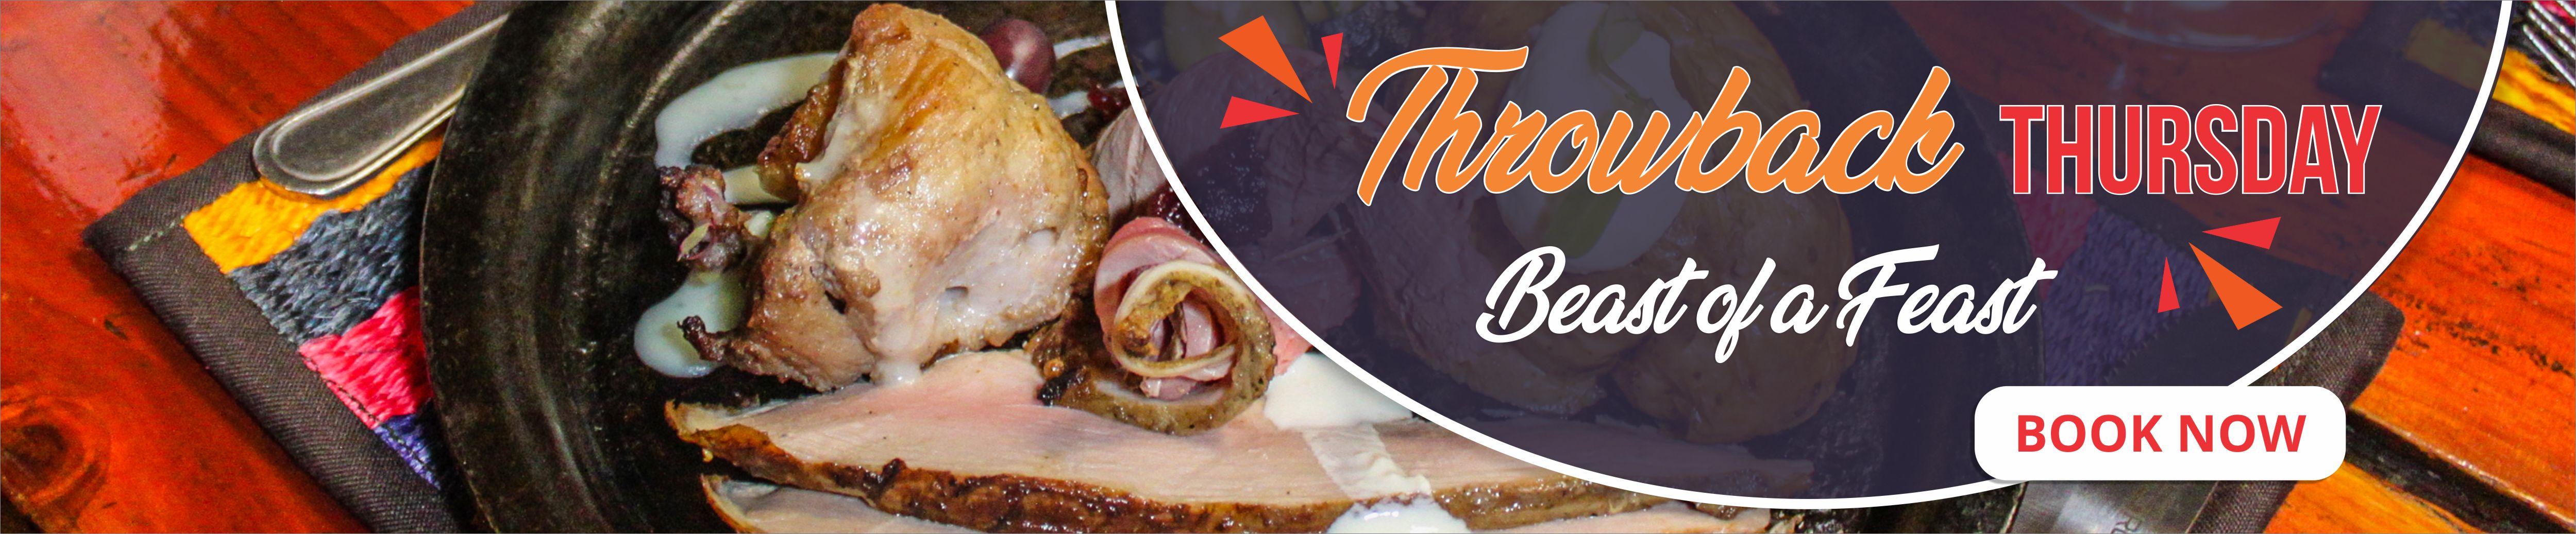 Carnivore Throwback Thursdays